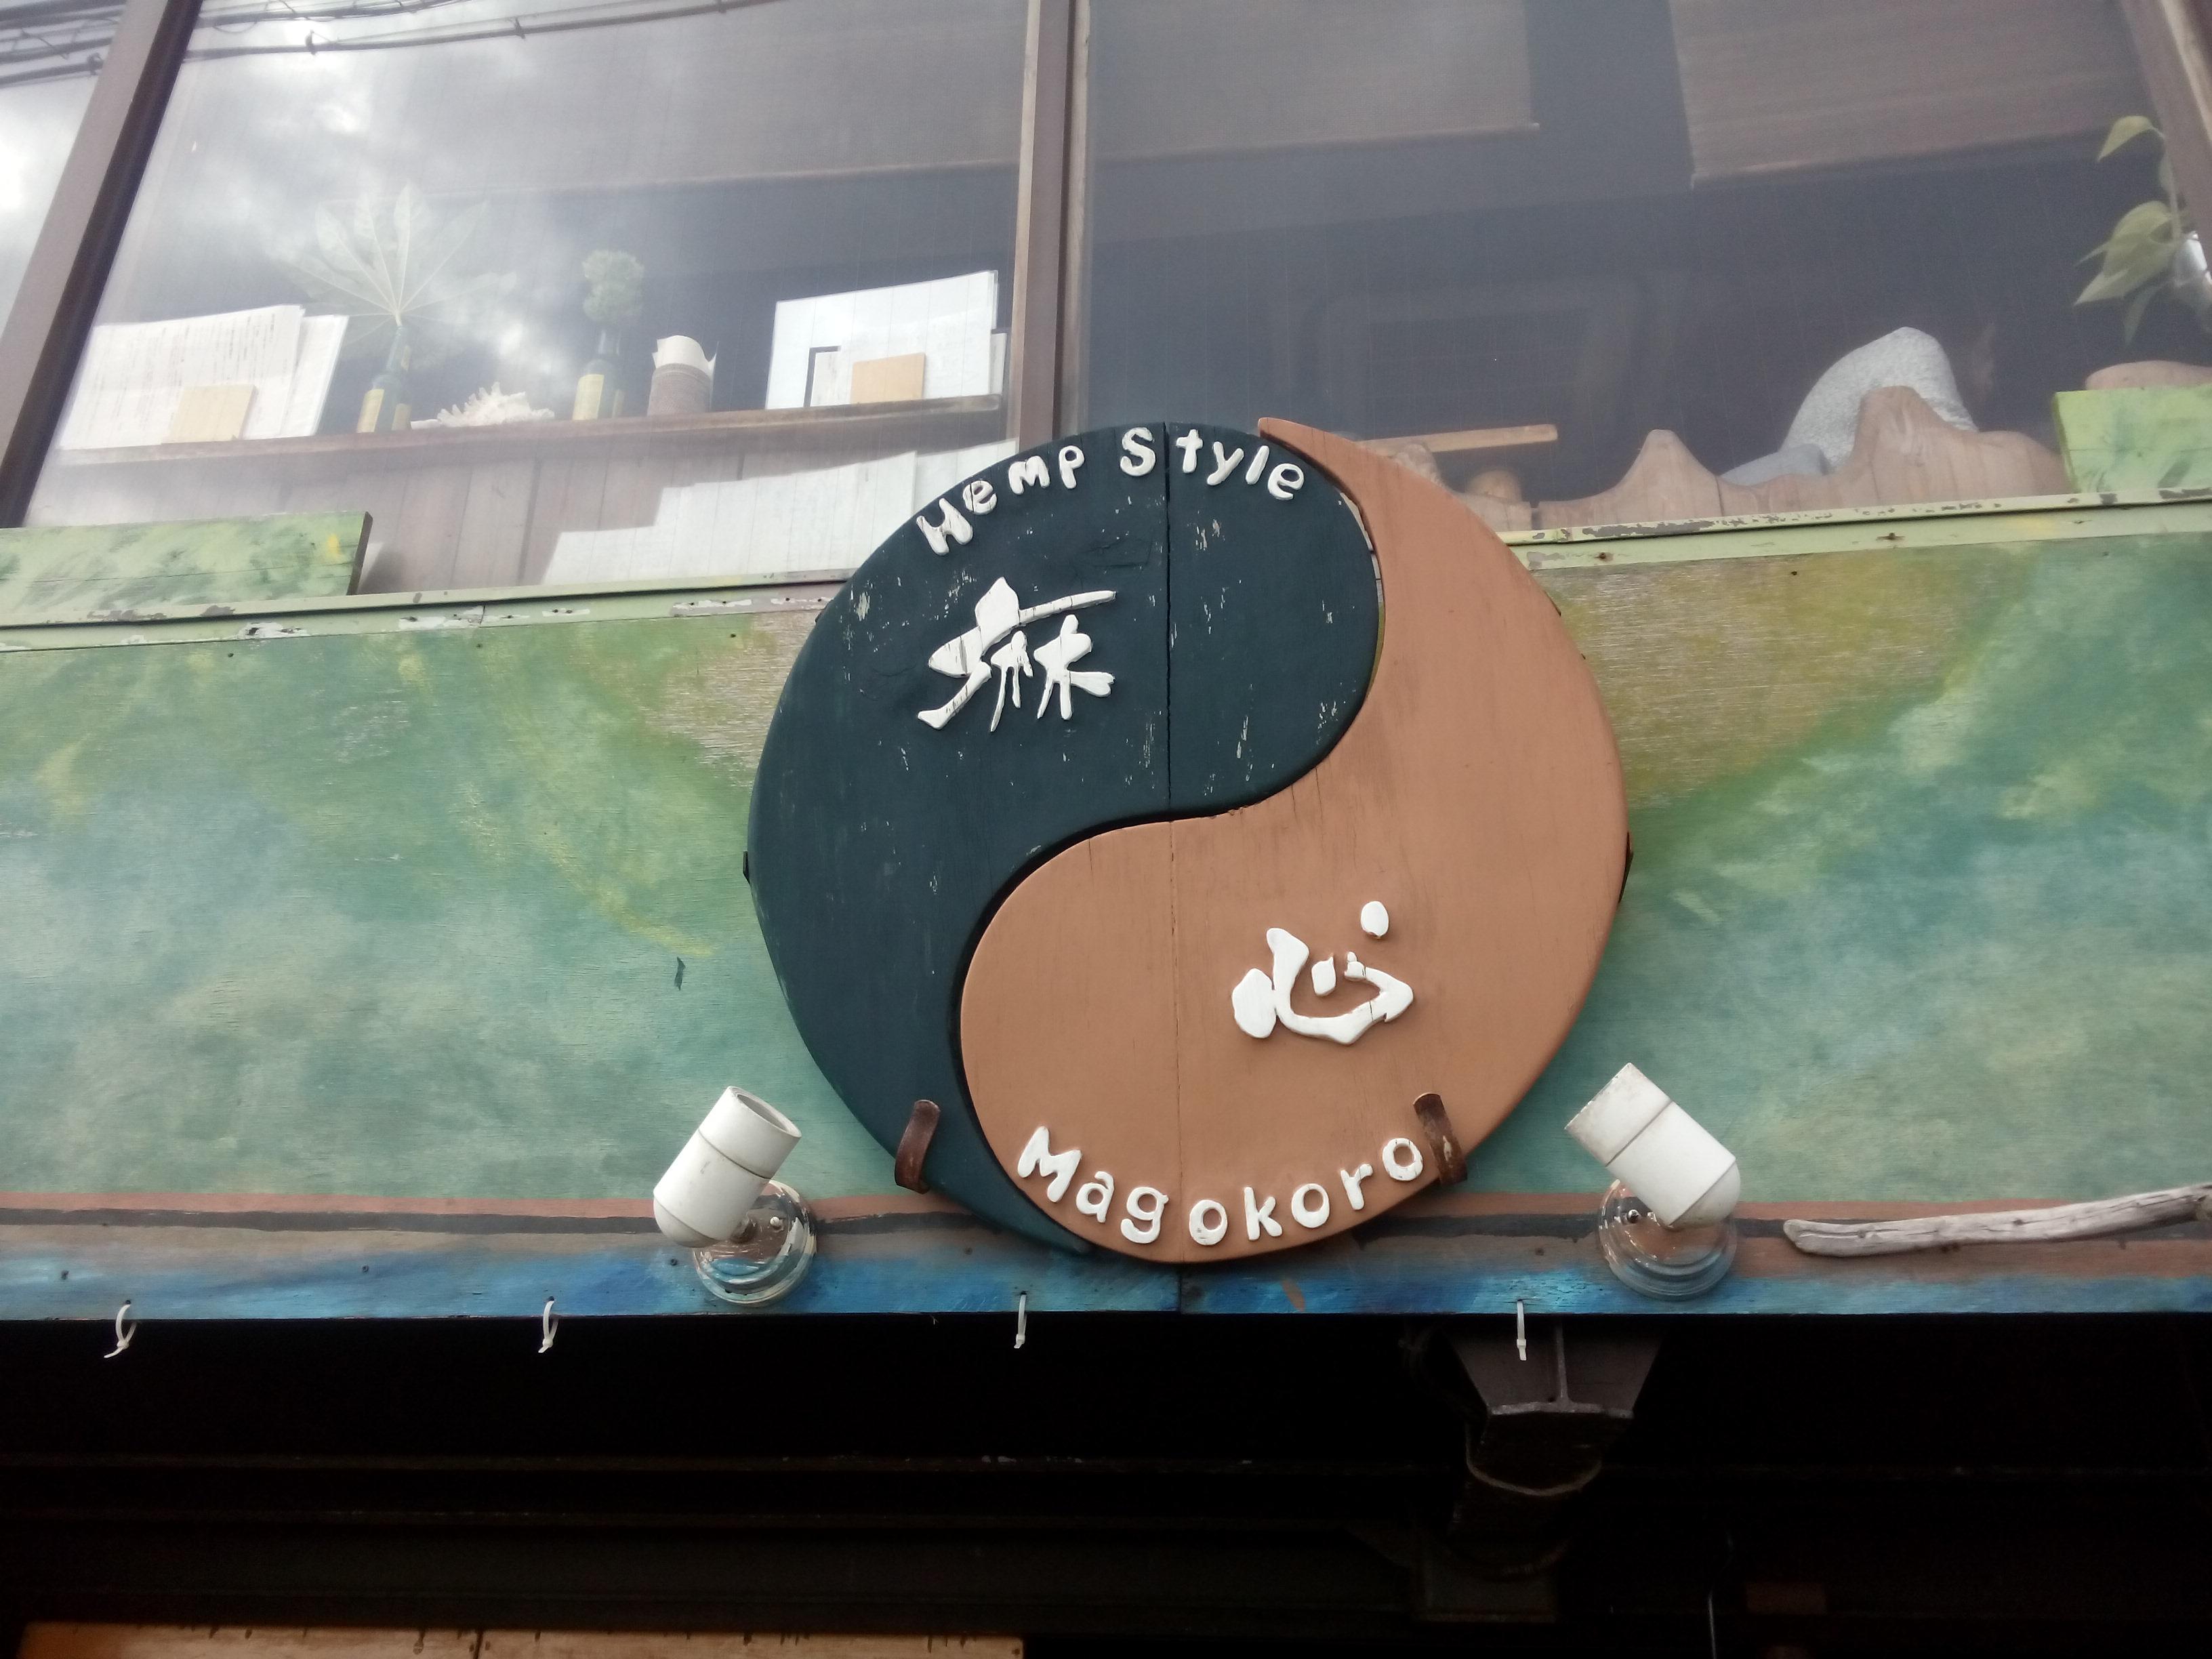 Magokoro Hemp Cafe